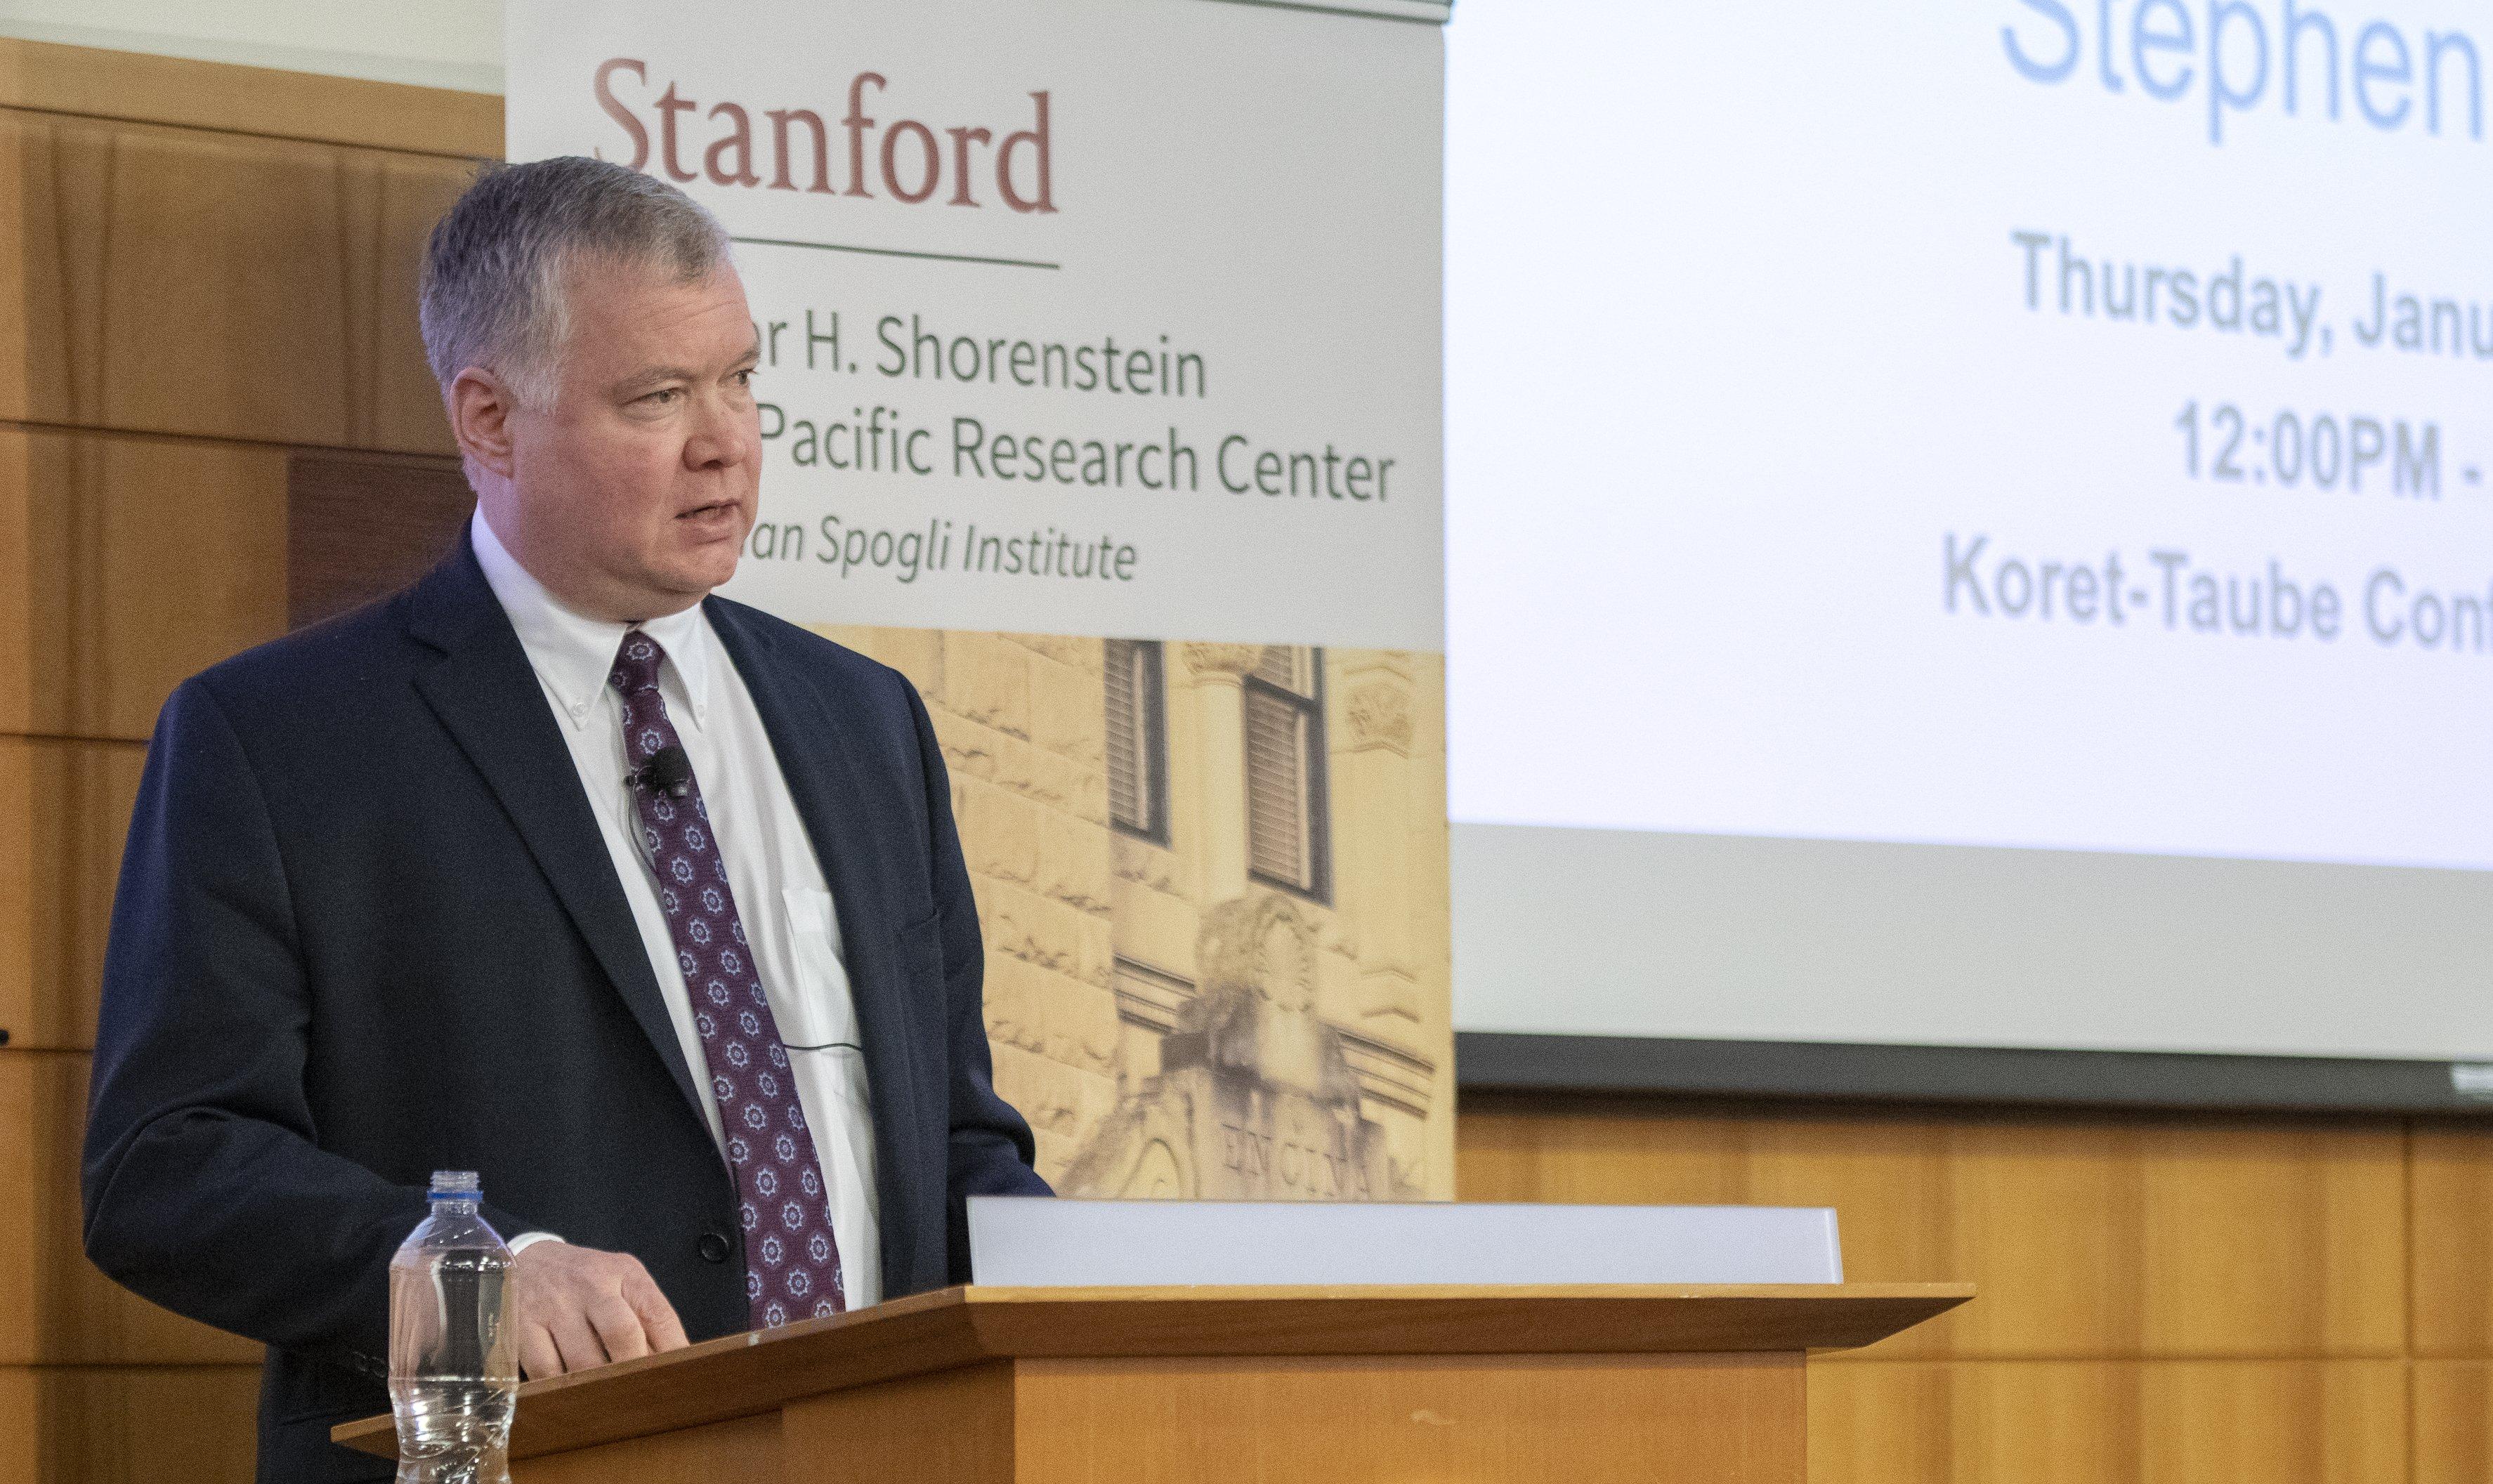 Stephen Biegun delivers remarks at Stanford at a Shorenstein APARC event.